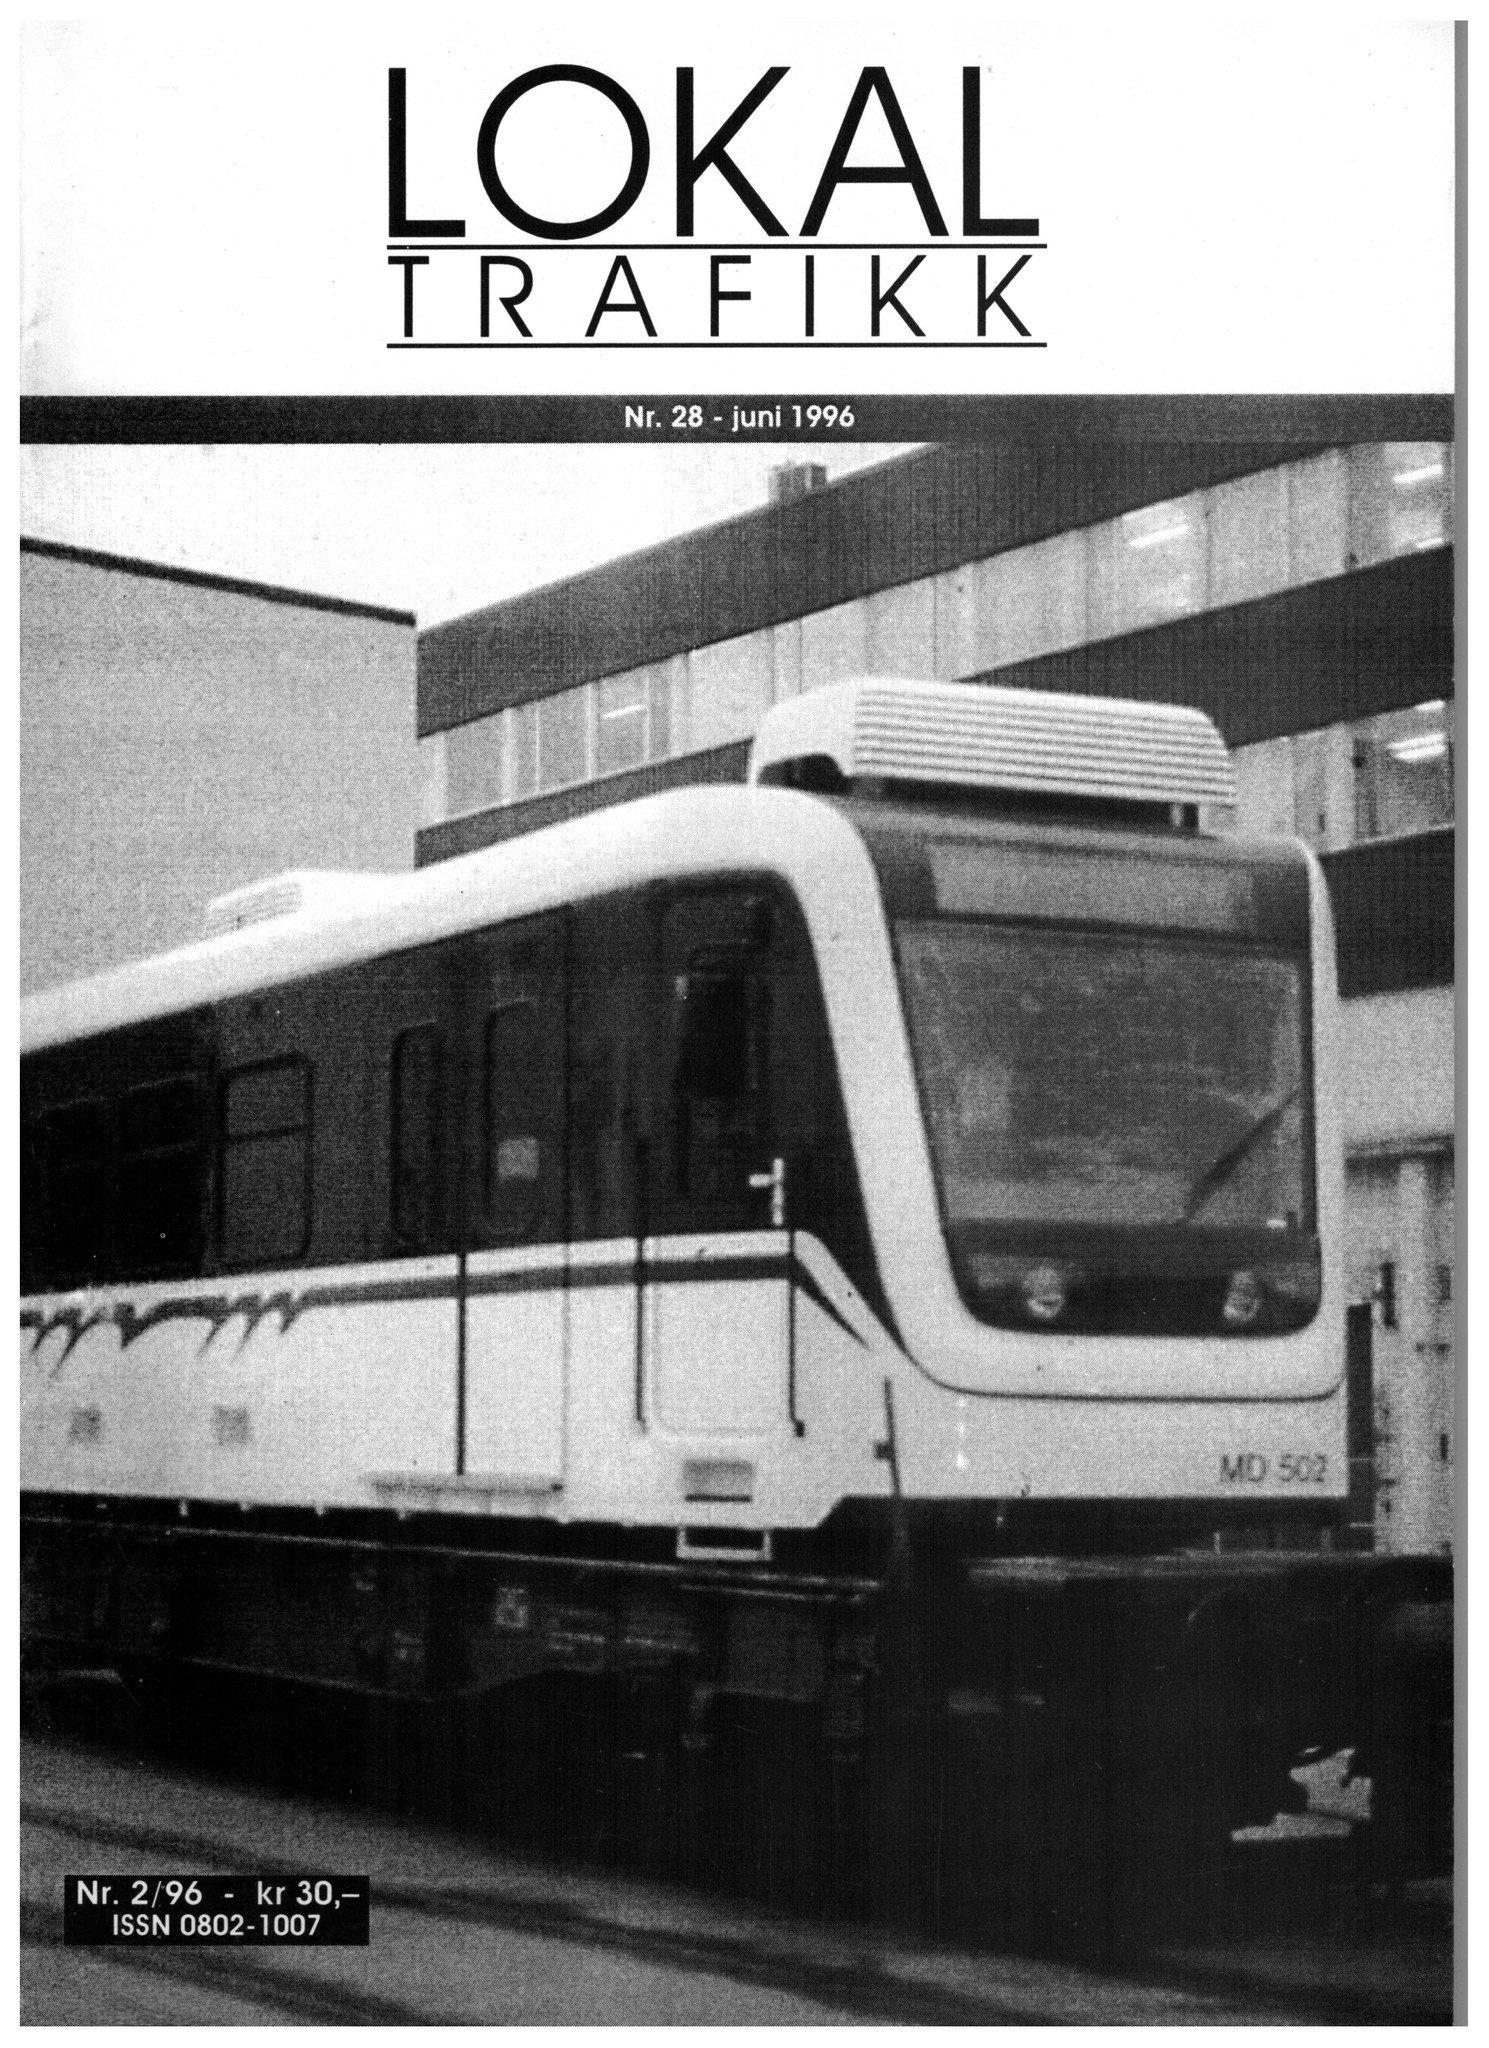 Lokaltrafikk #028